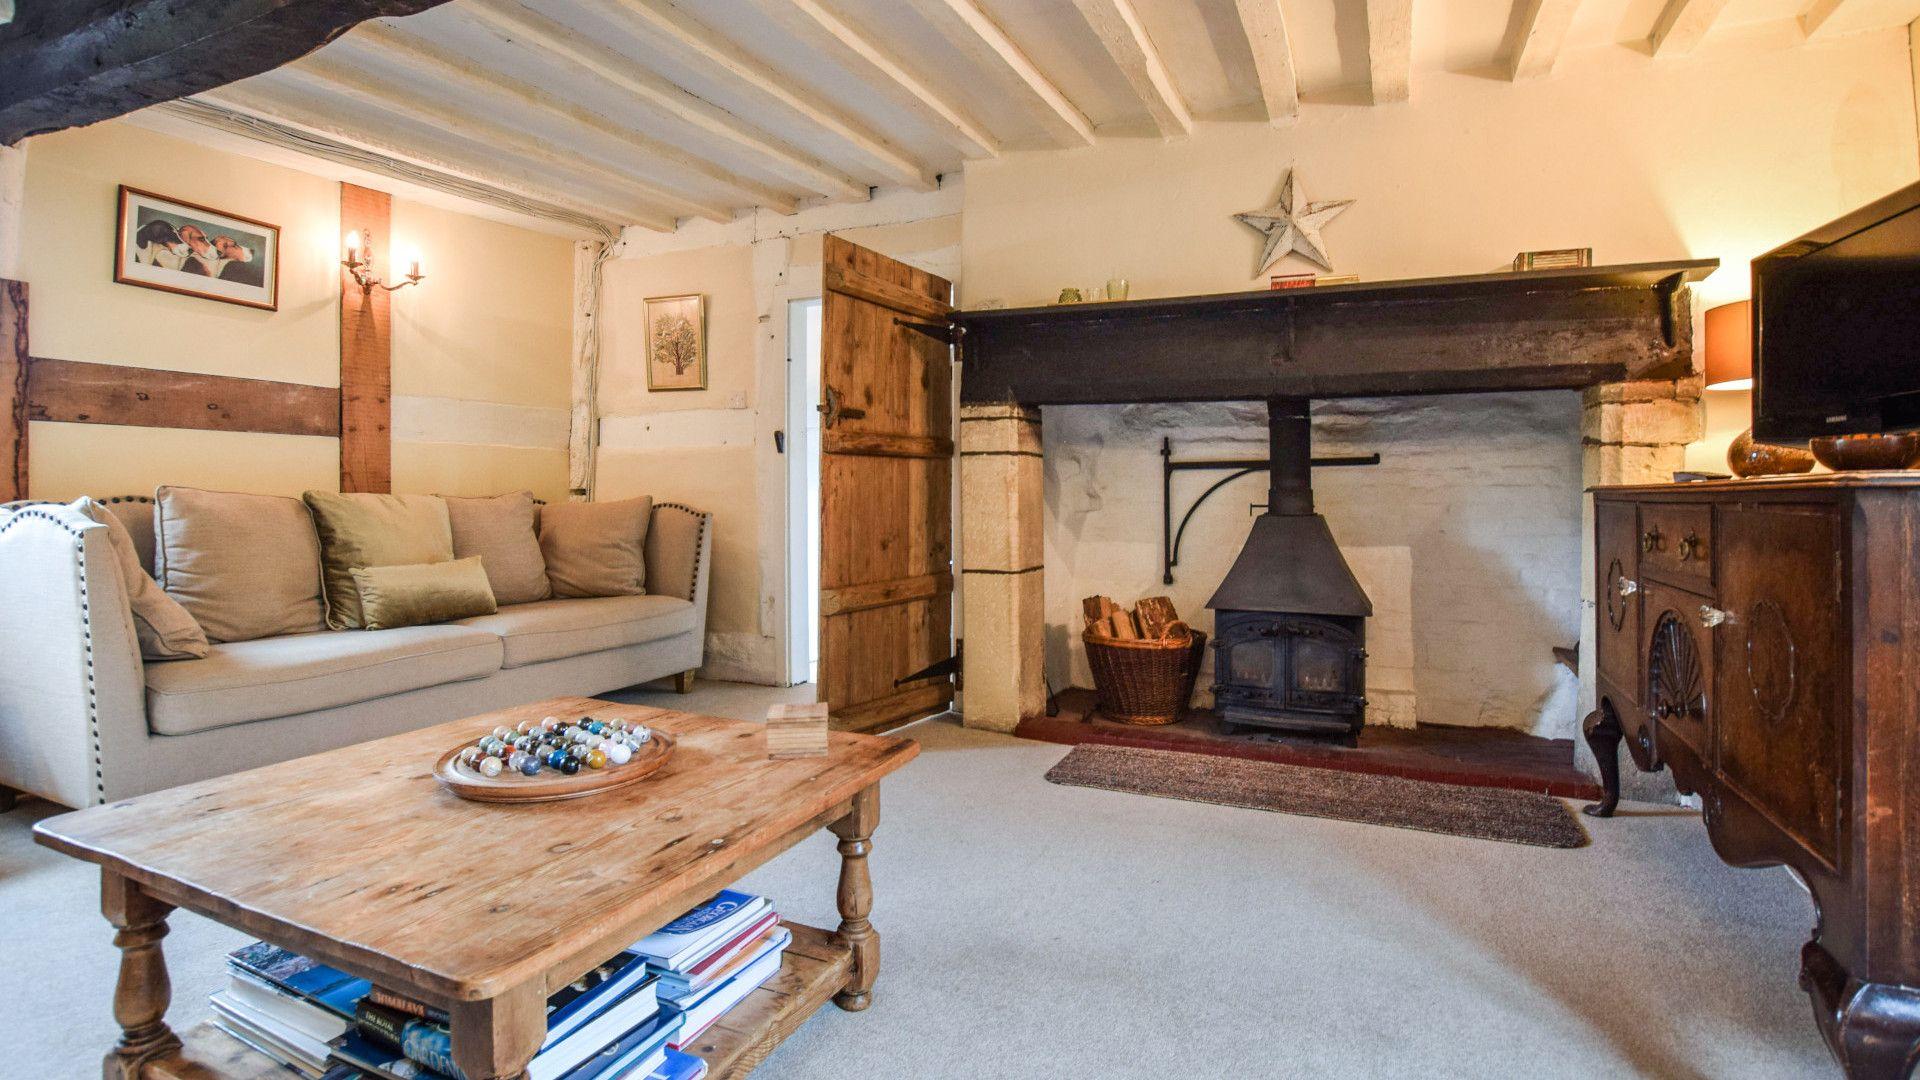 Living room with log burner, Cyder Press House, Bolthole Retreats